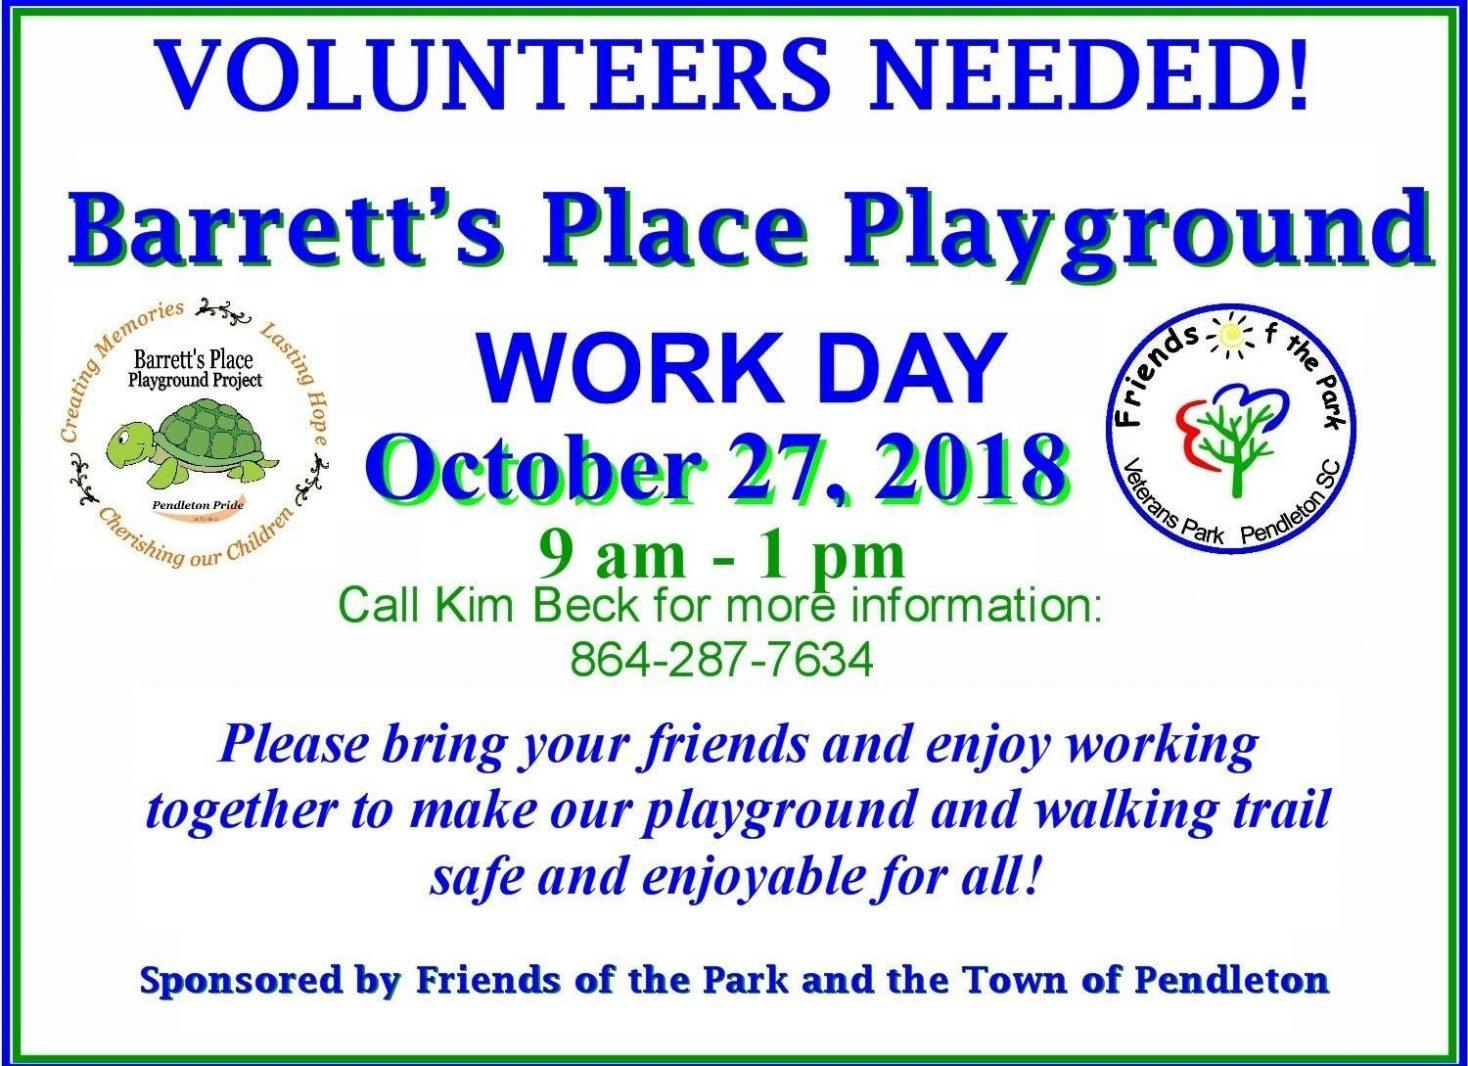 Barrett's Place Playground Fall Maintenance Day